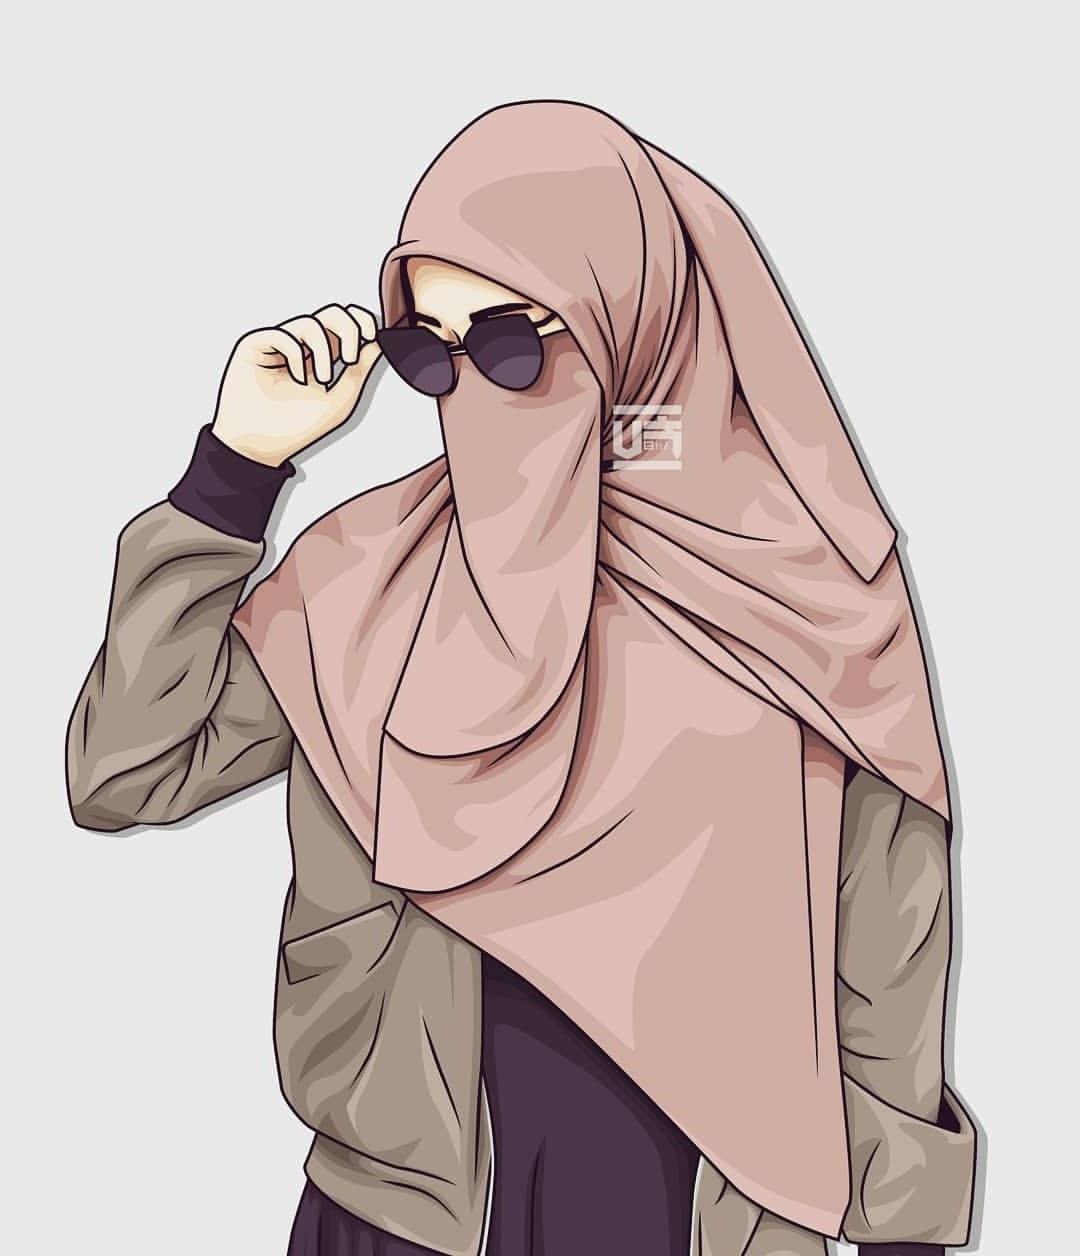 Ide Muslimah Kartun Keren Rldj 1000 Gambar Kartun Muslimah Cantik Bercadar Kacamata El